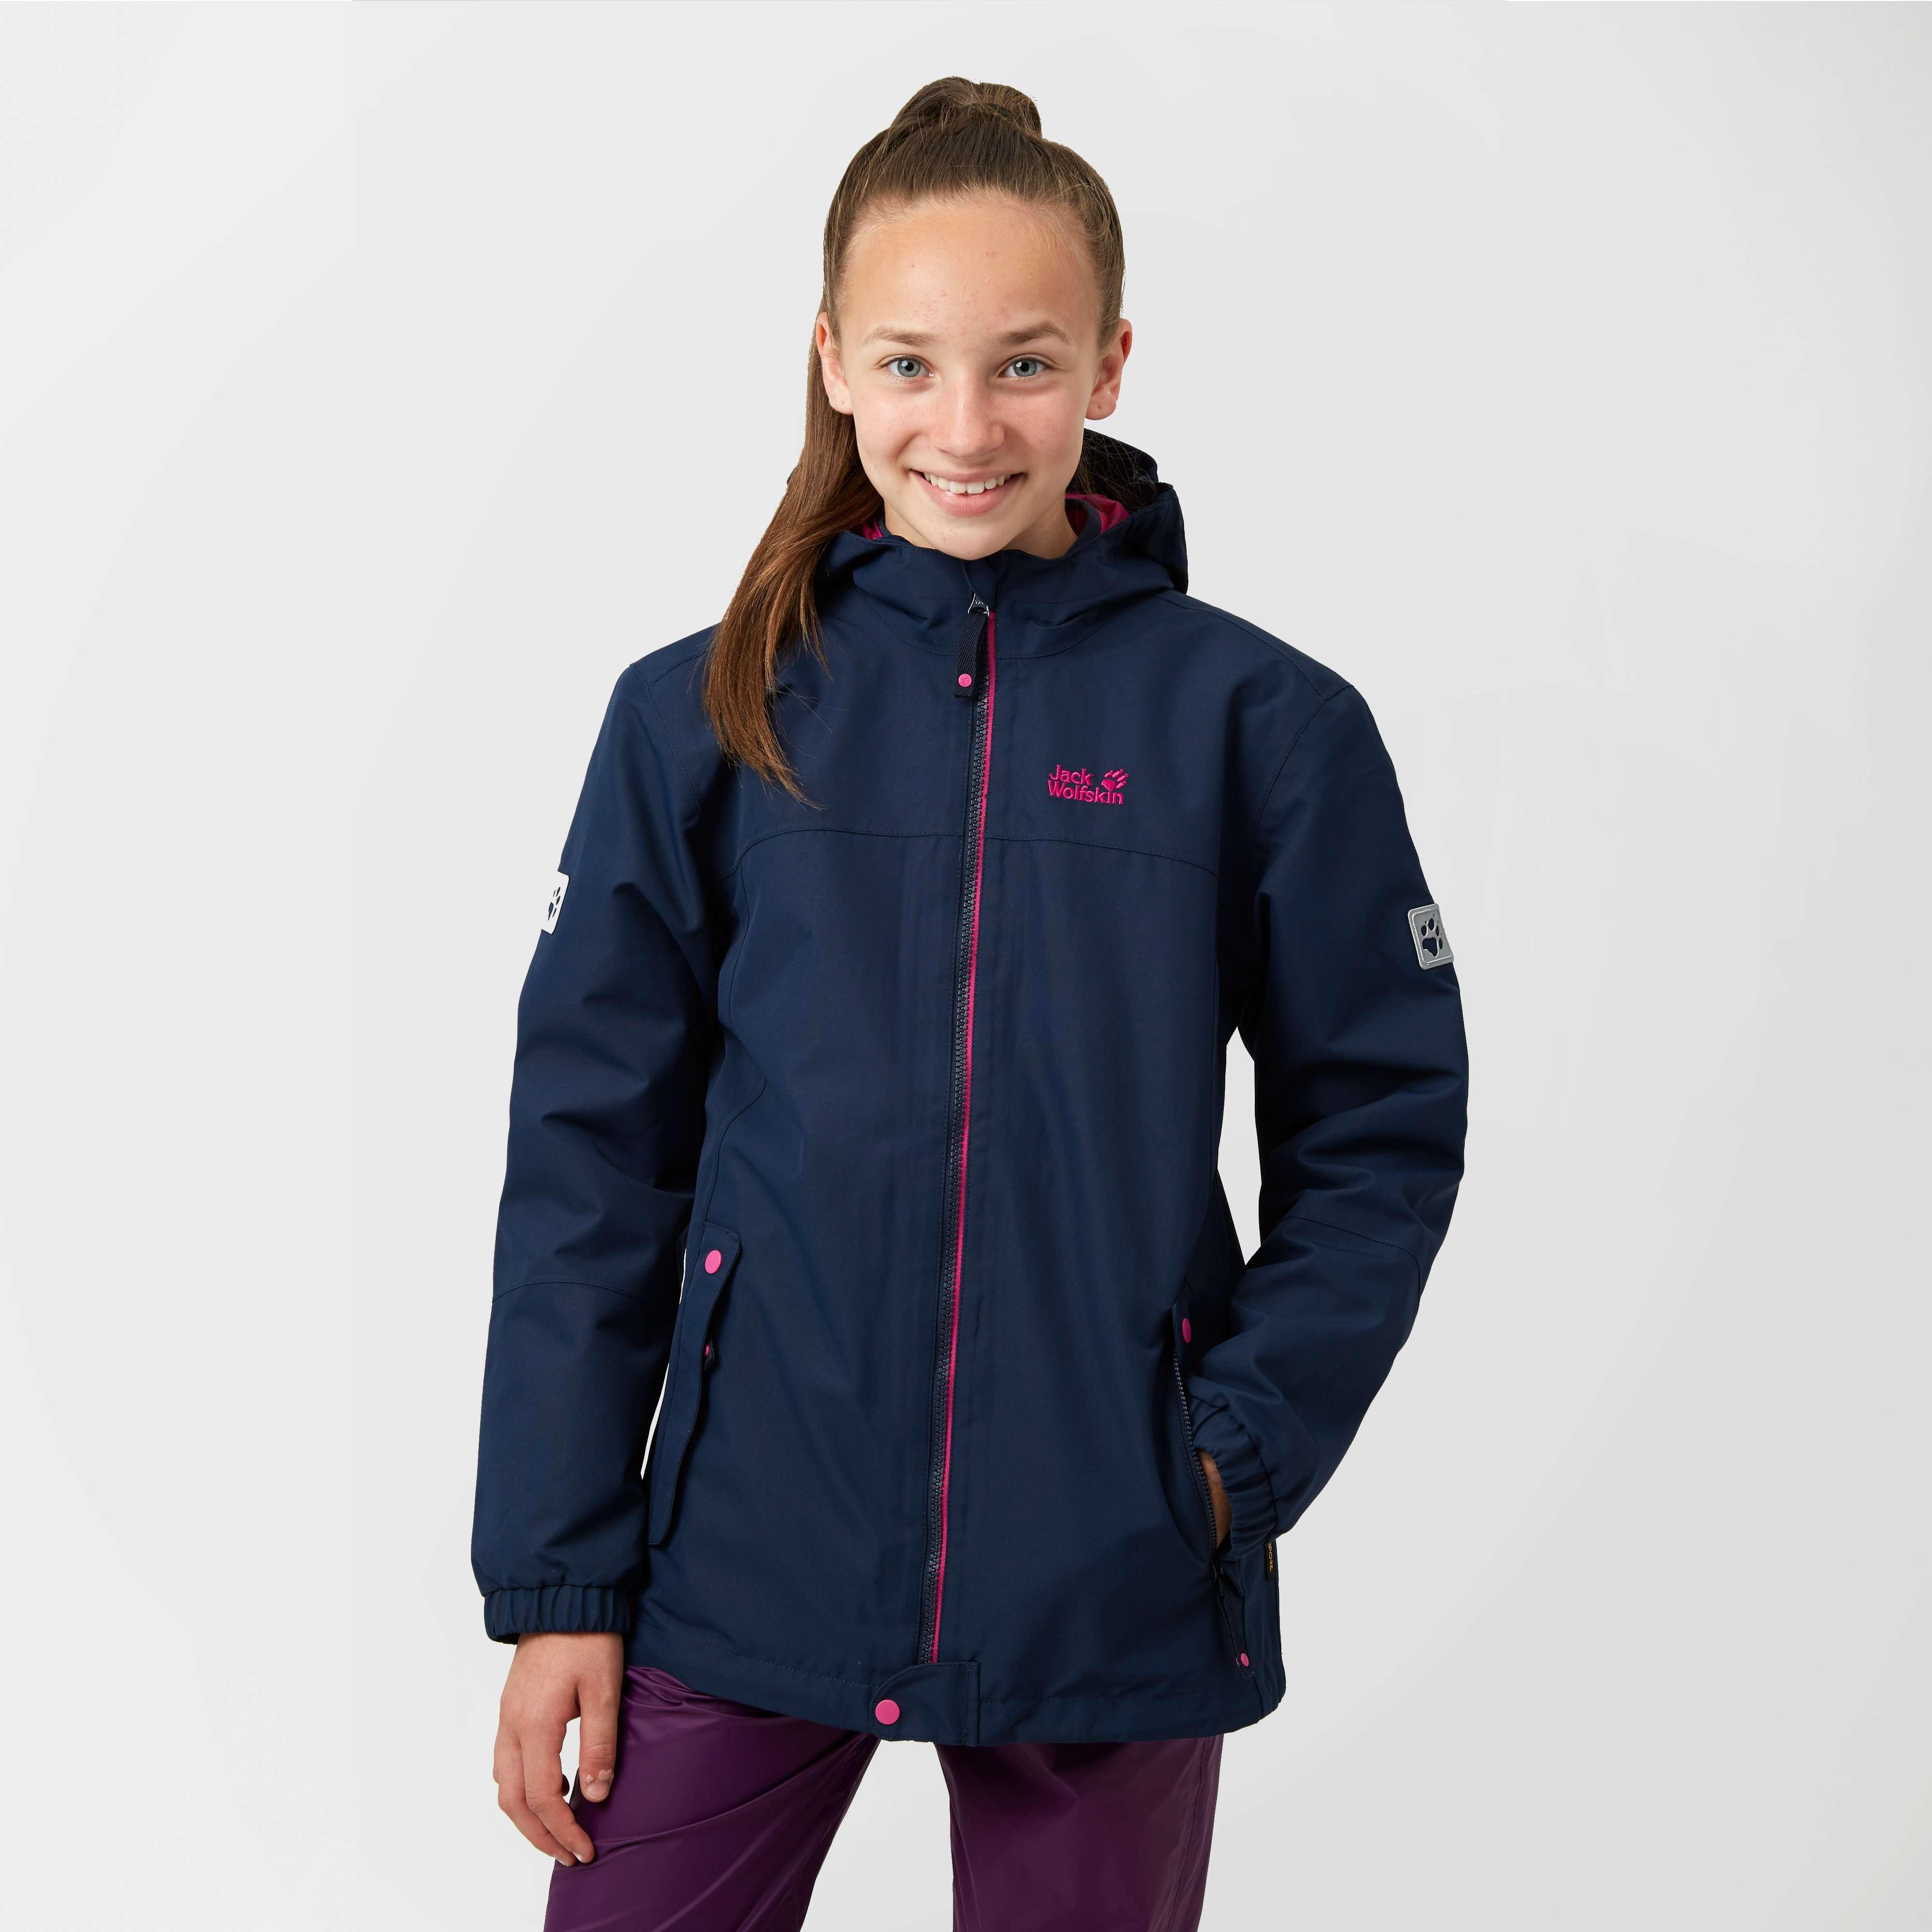 JACK WOLFSKIN Girl's Iceland 3 in 1 Jacket